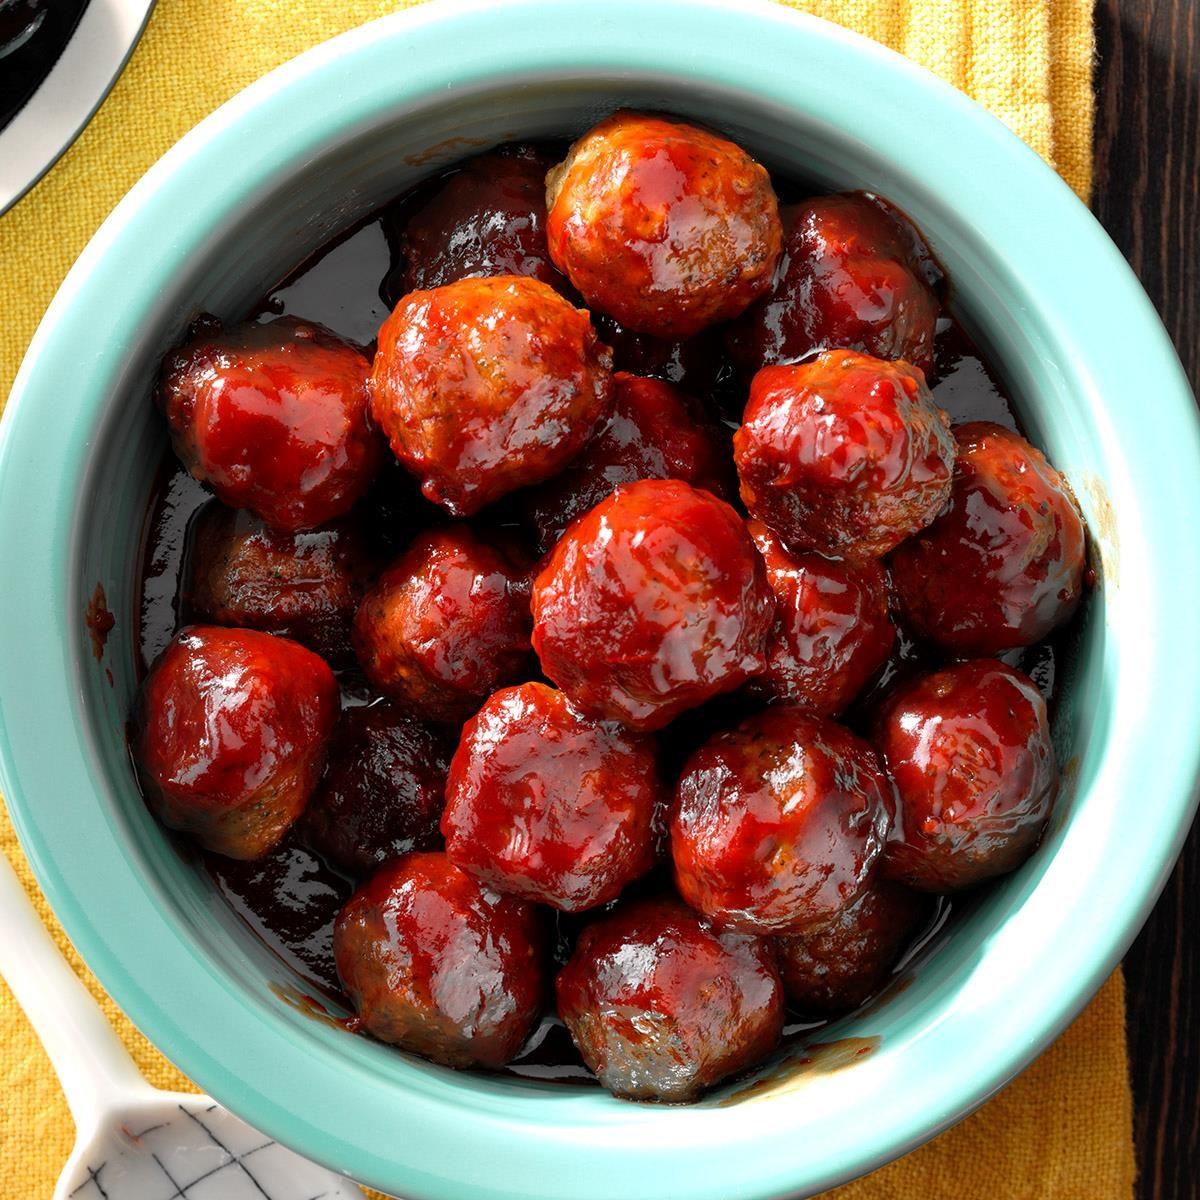 Chili And Jelly Meatballs Recipe